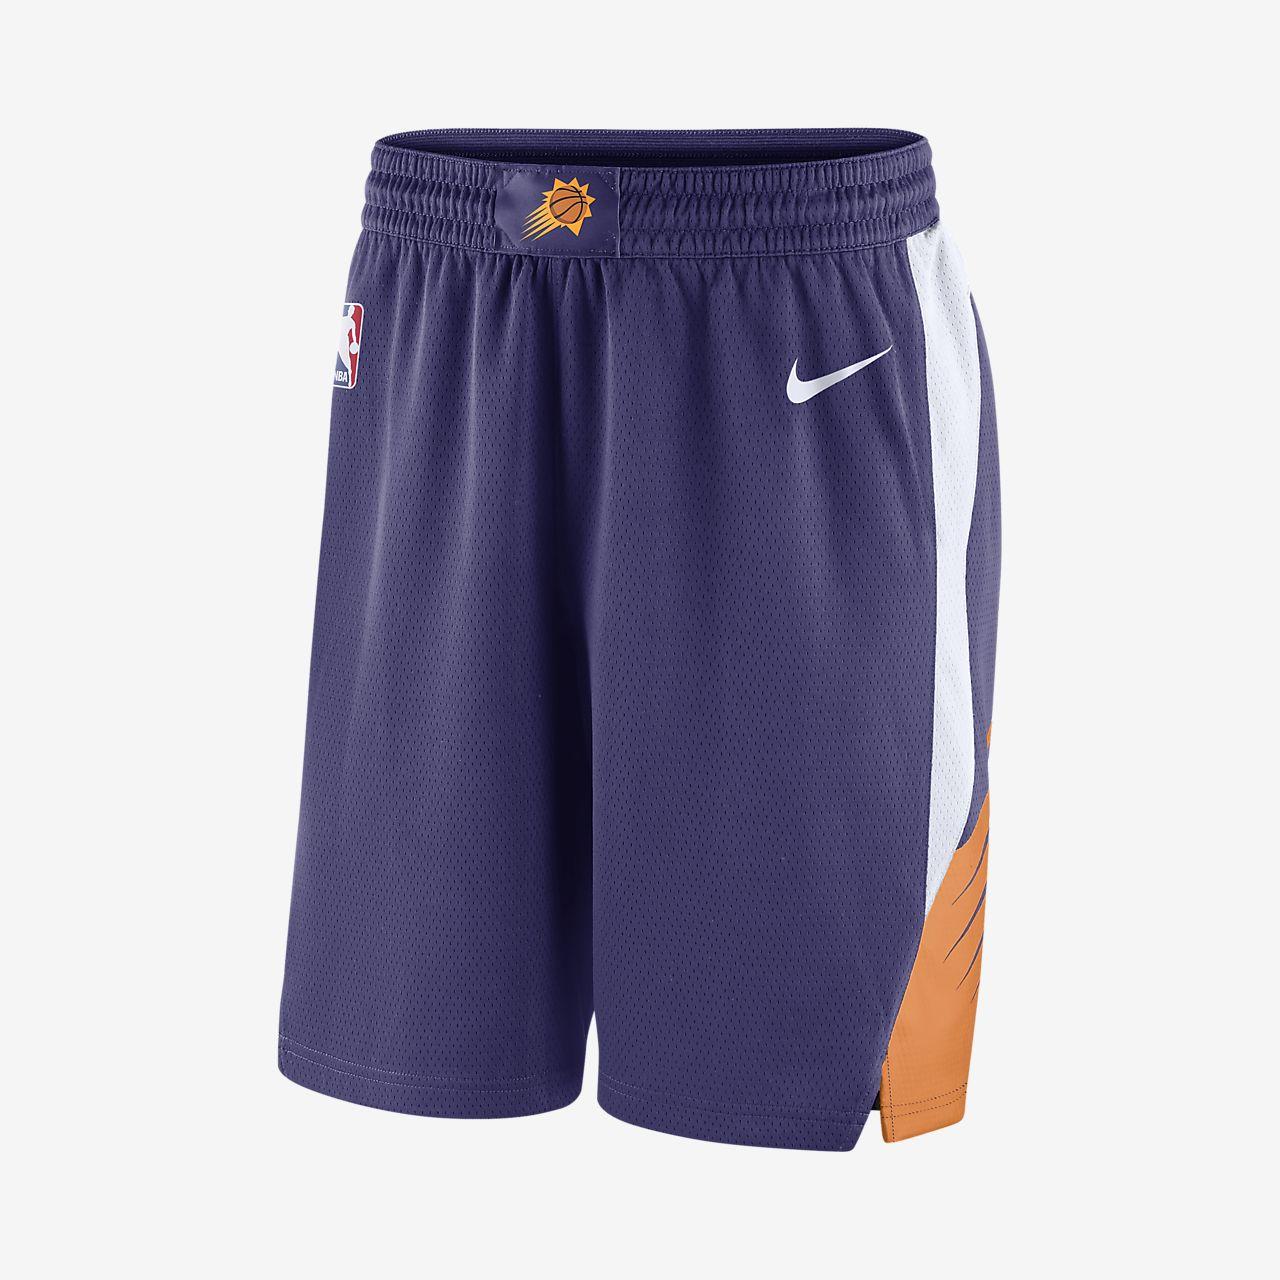 ... Phoenix Suns Nike Icon Edition Swingman Men's NBA Shorts